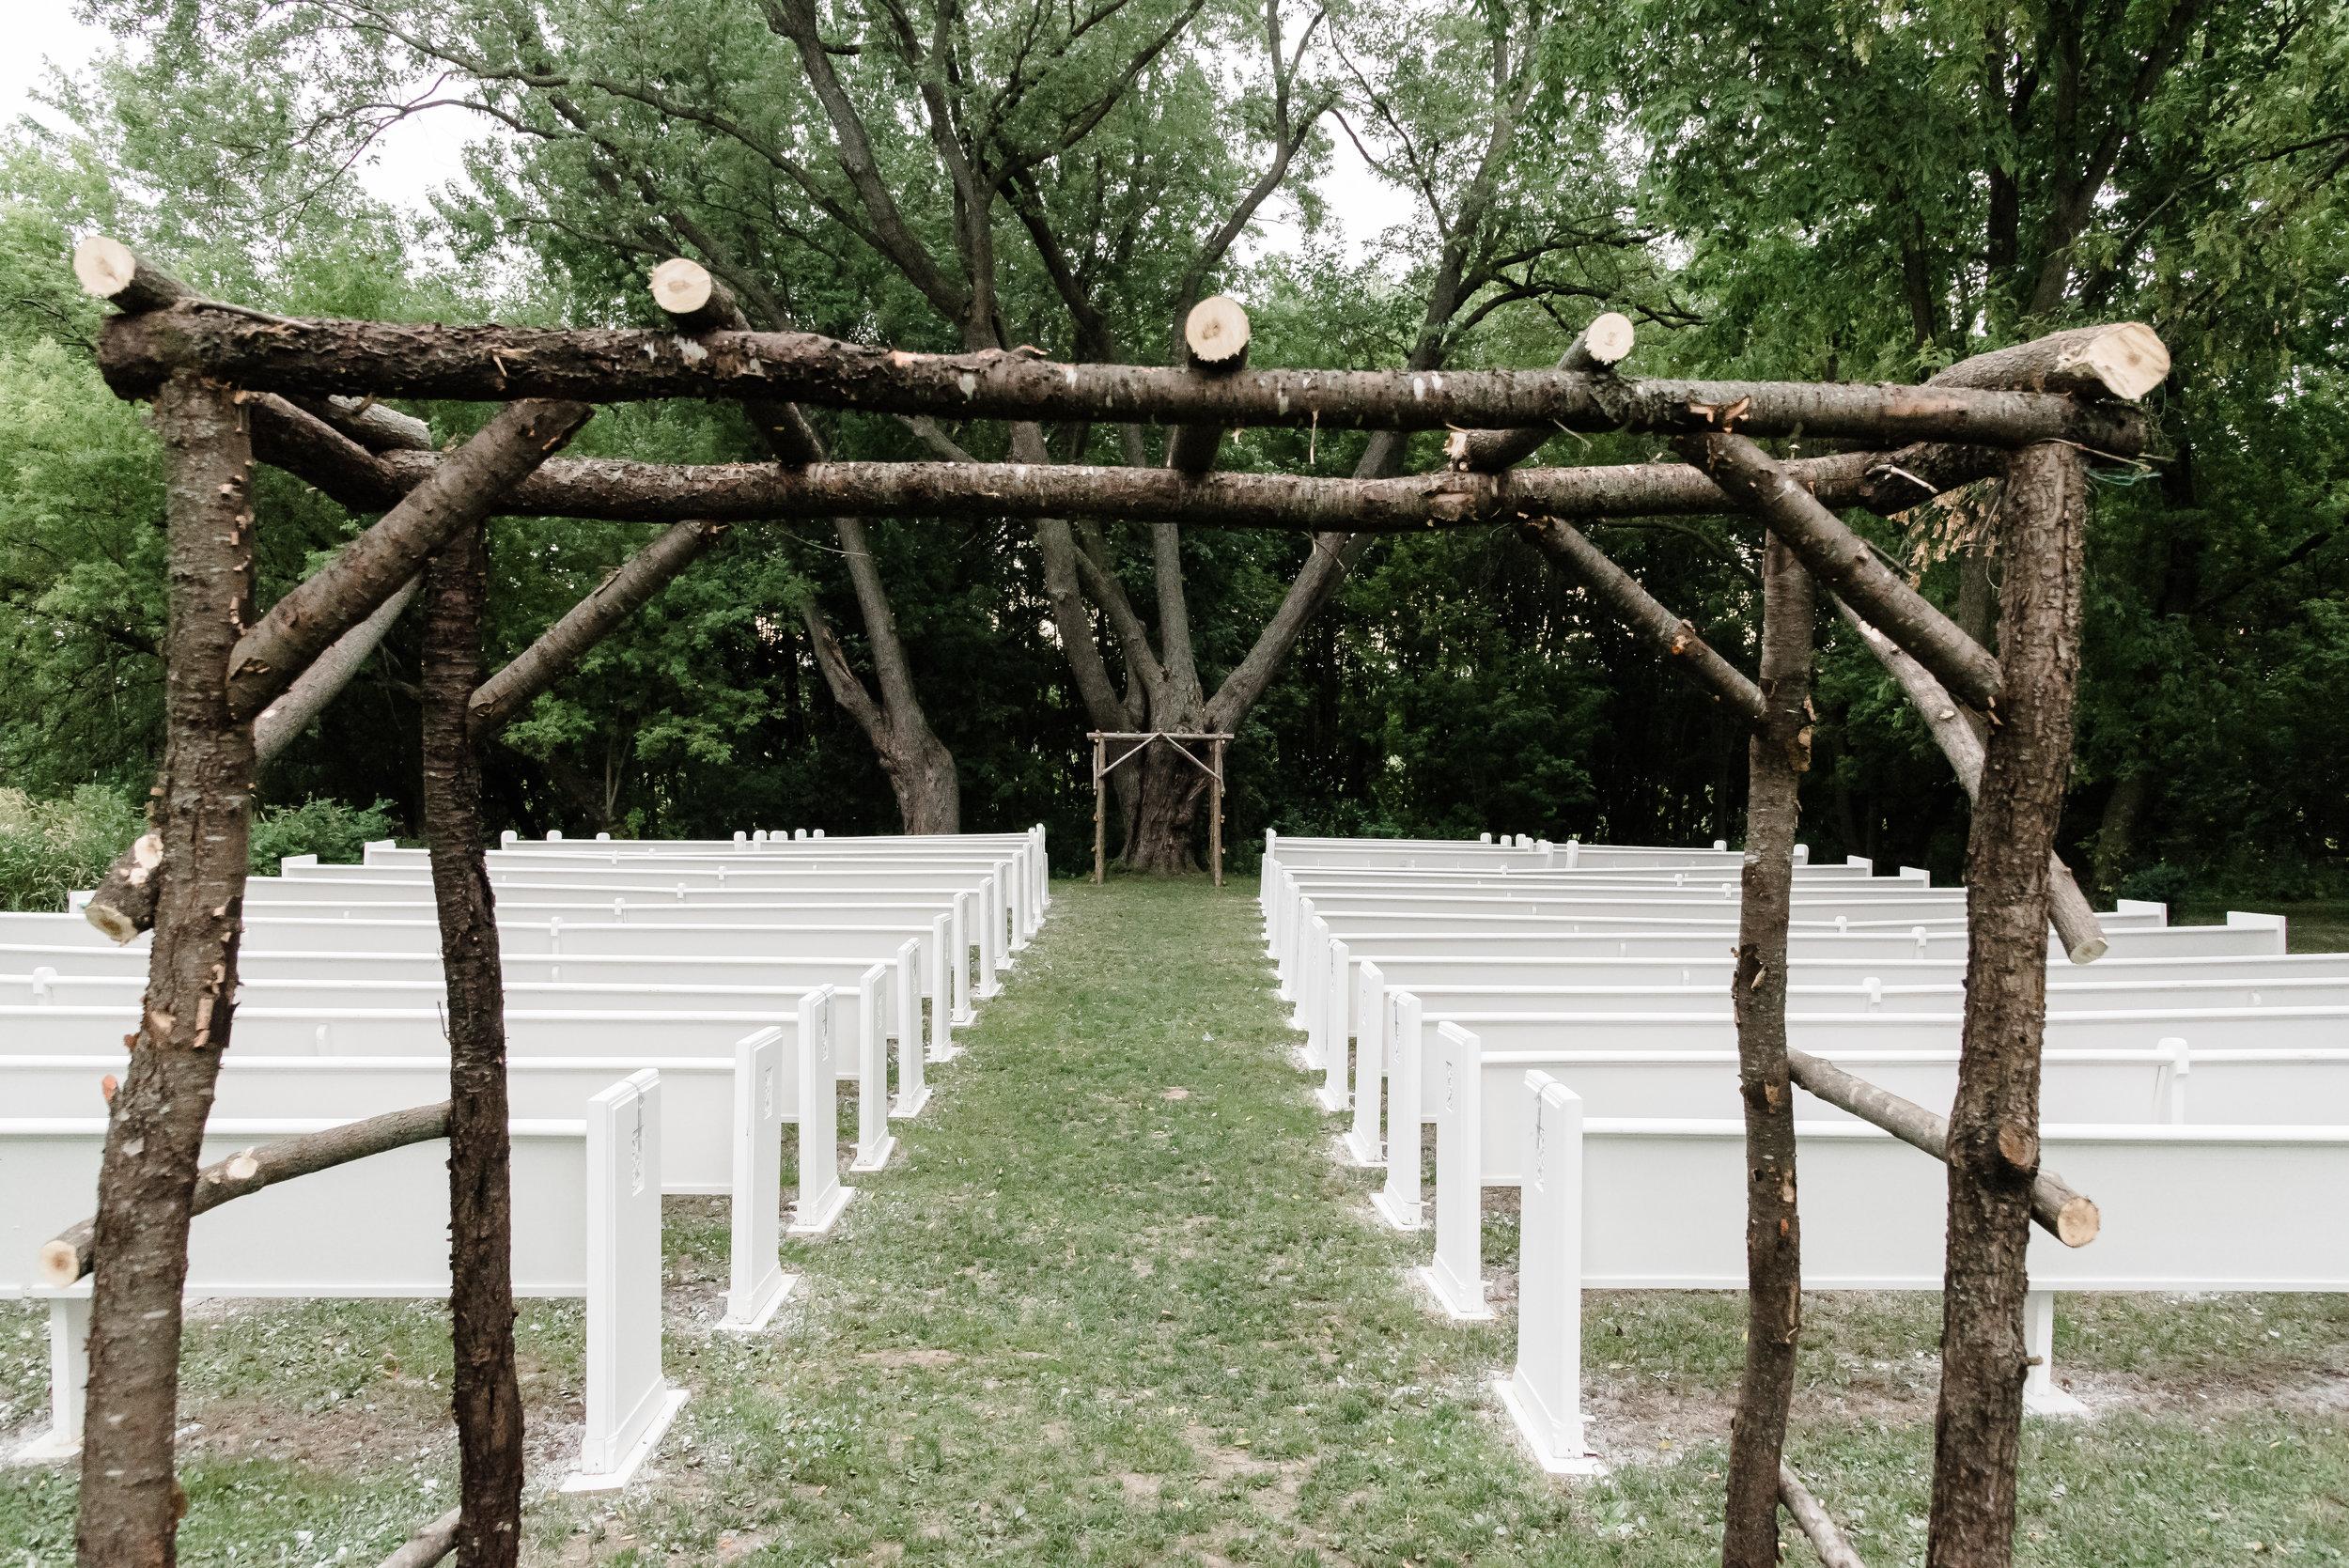 Bloom Lake Barn Outdoor Chapel Ceremony Area - Shafer, MN Wedding Venue